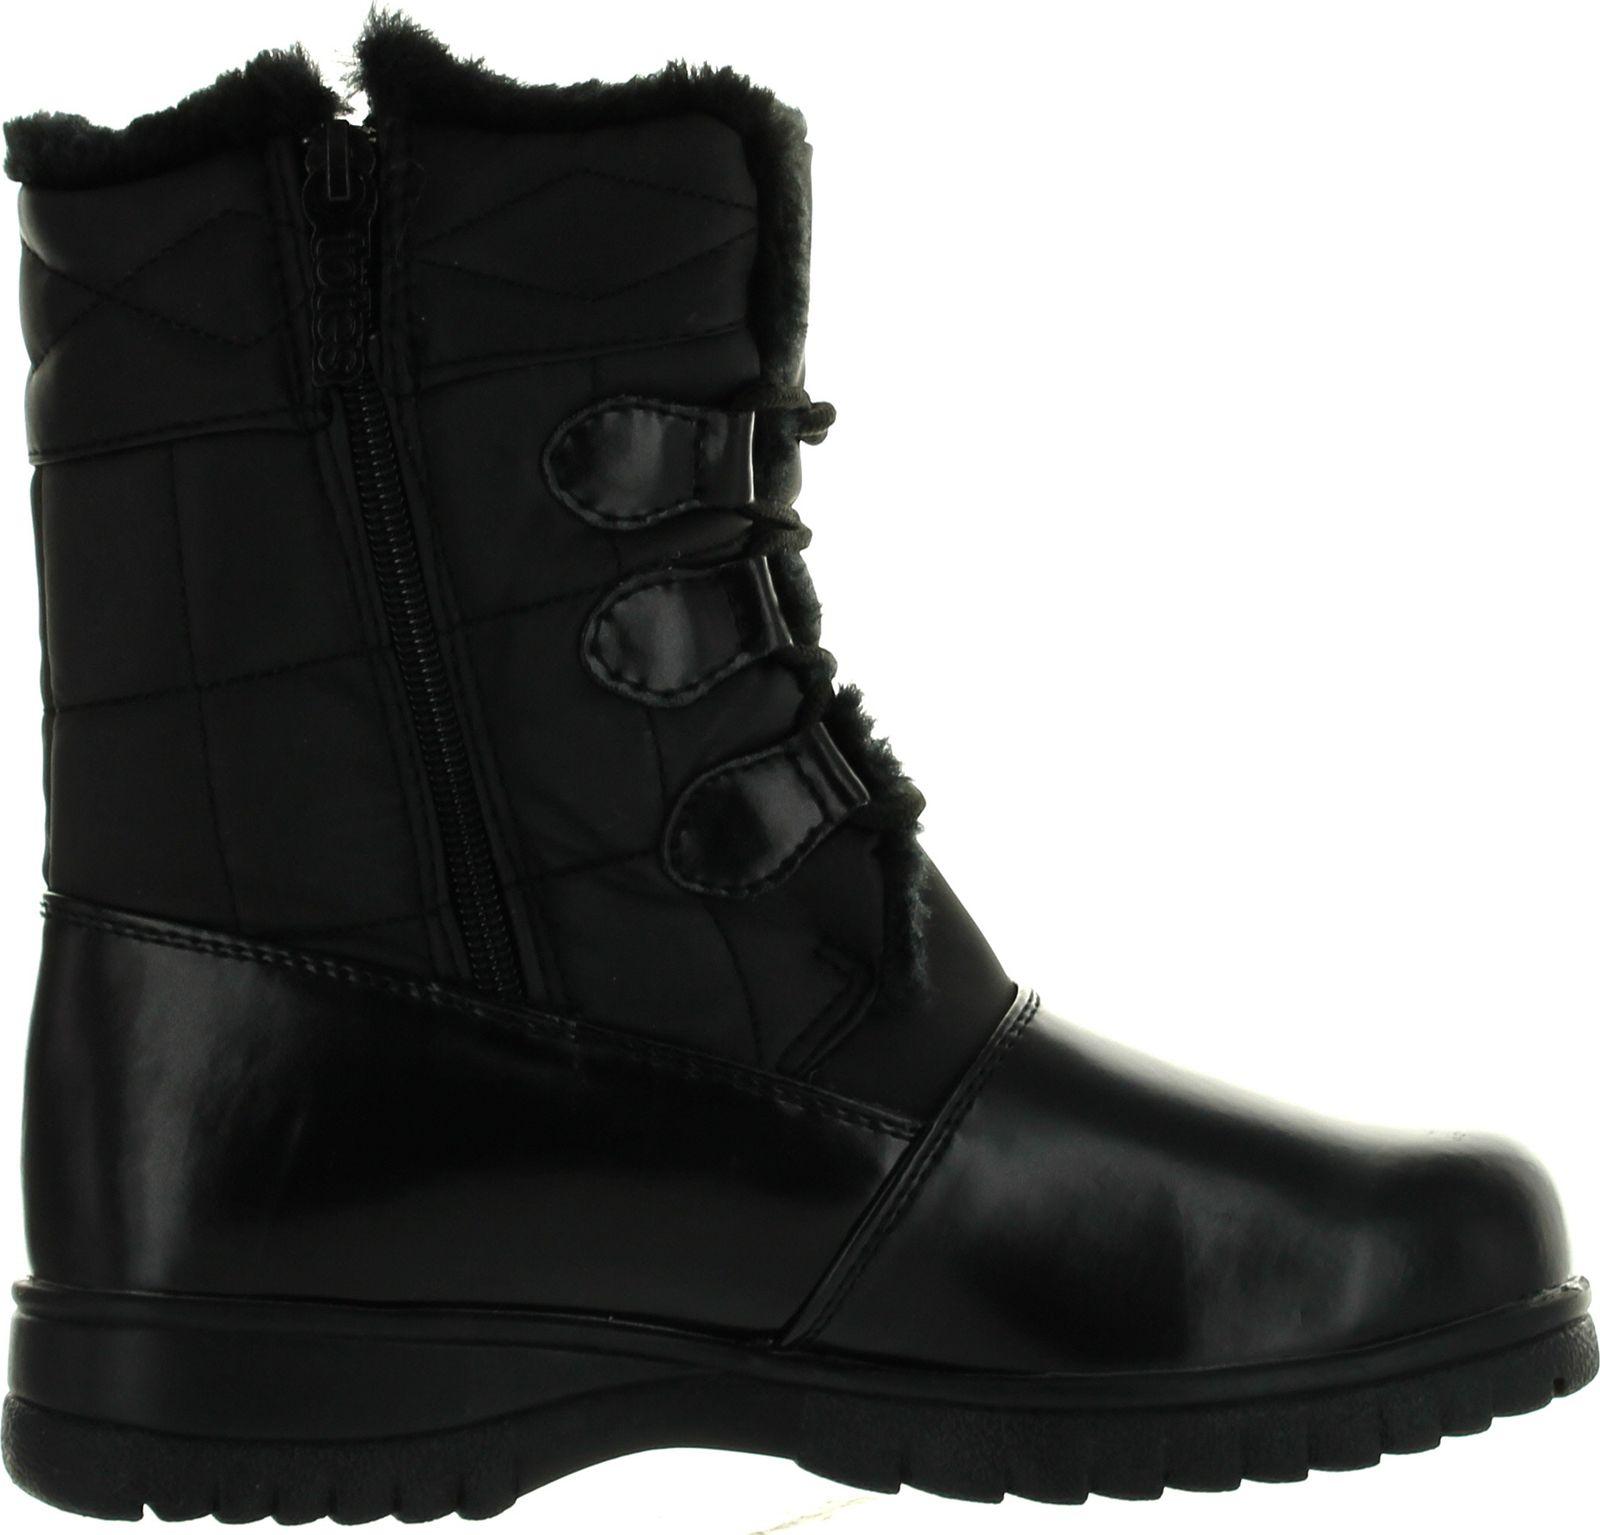 Totes Womens Karla Winter Waterproof Snow Boots | eBay